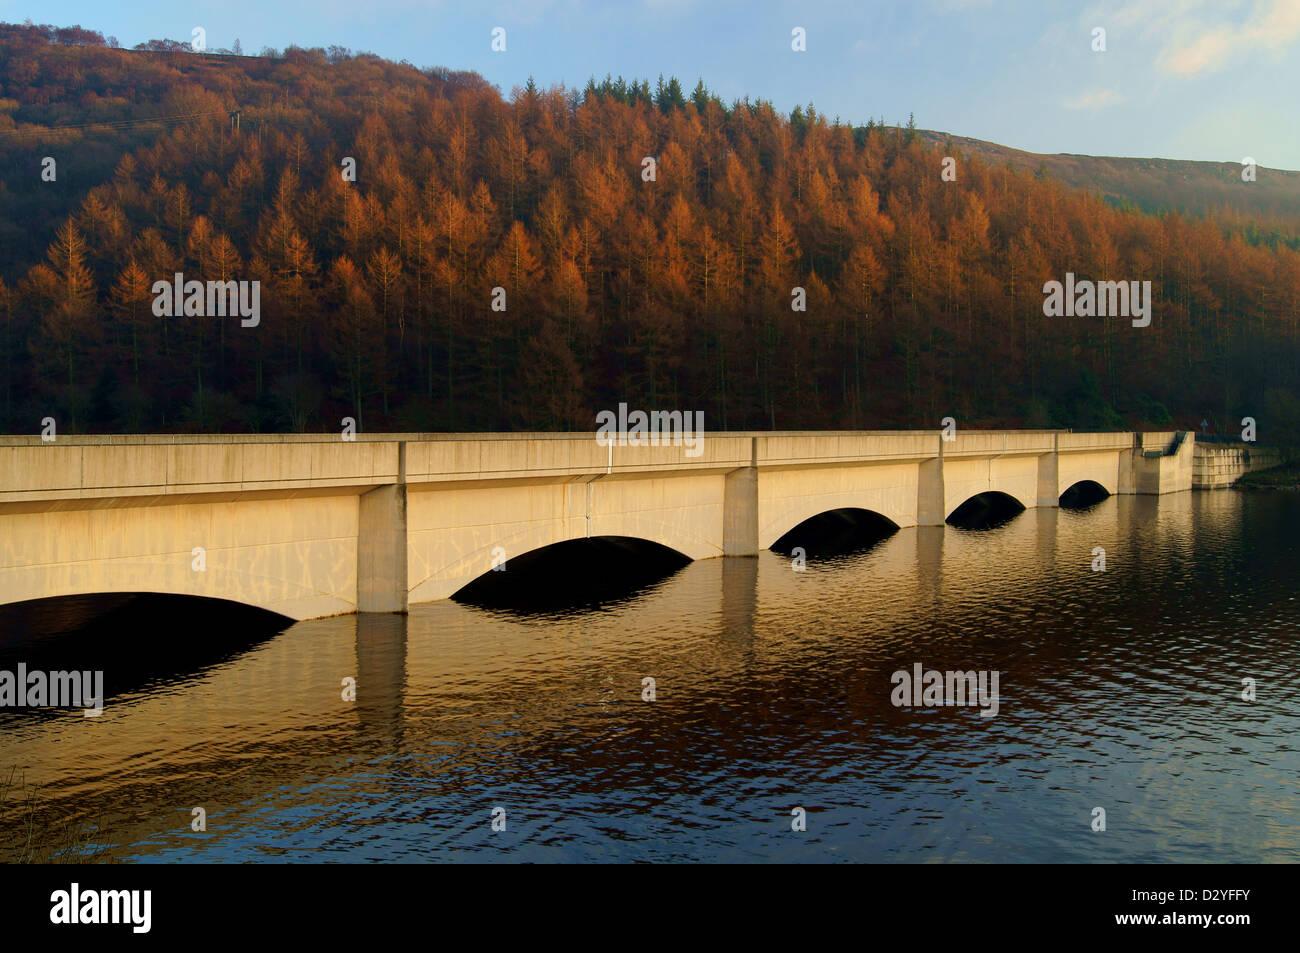 UK,Peak District,Derbyshire,Ladybower Viaduct & Reservoir - Stock Image